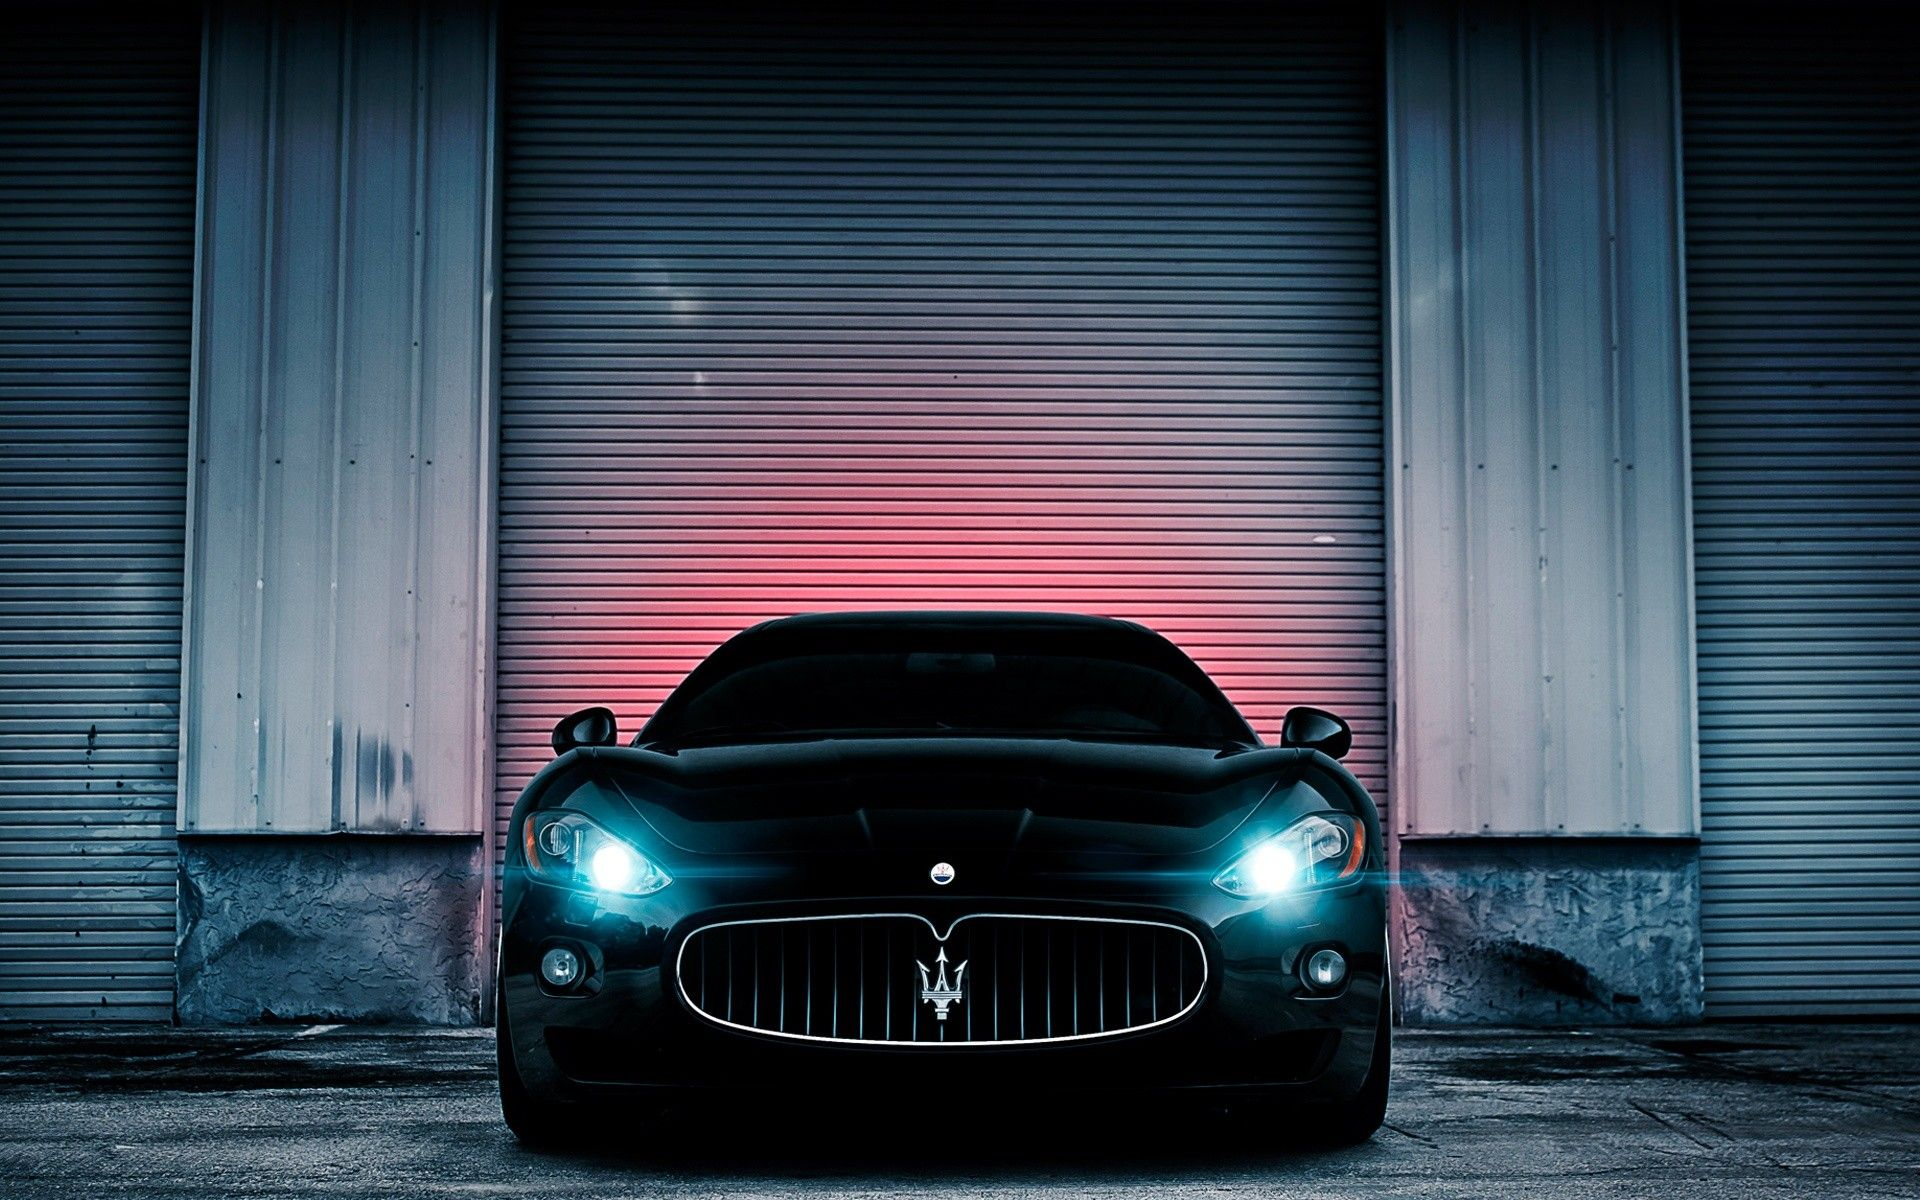 Best Of Maserati Logo Hd Wallpapers 1080p Gran Turismo Wolkswagen Auto